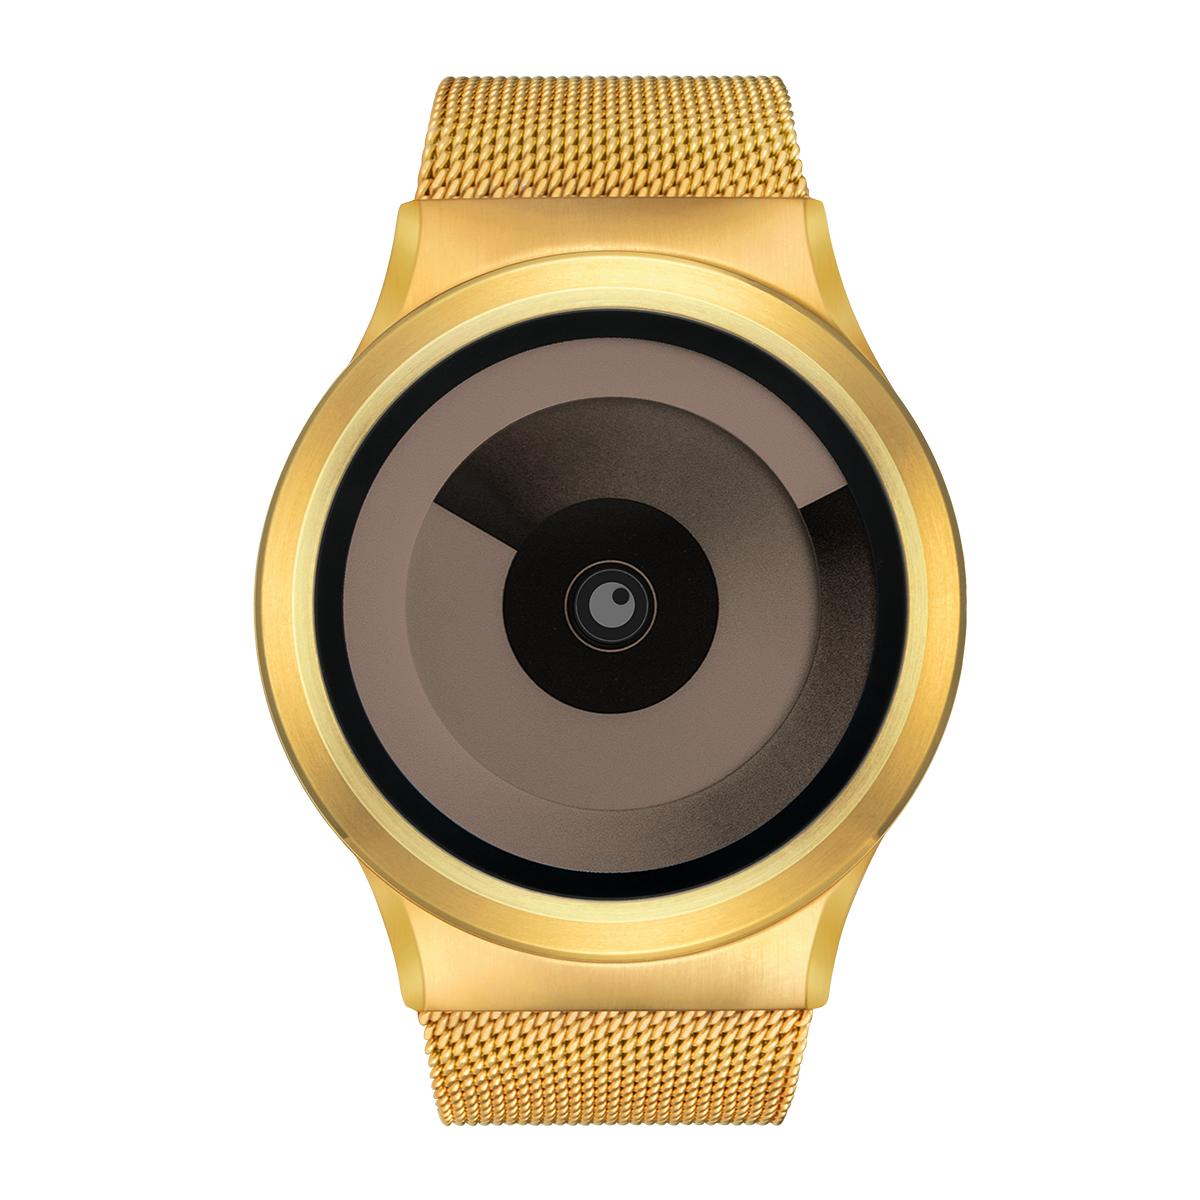 ZEROO SPIRAL GALAXY ゼロ 電池式クォーツ 腕時計 [W06019B04SM04] ベージュ デザインウォッチ ペア用 メンズ レディース ユニセックス おしゃれ時計 デザイナーズ